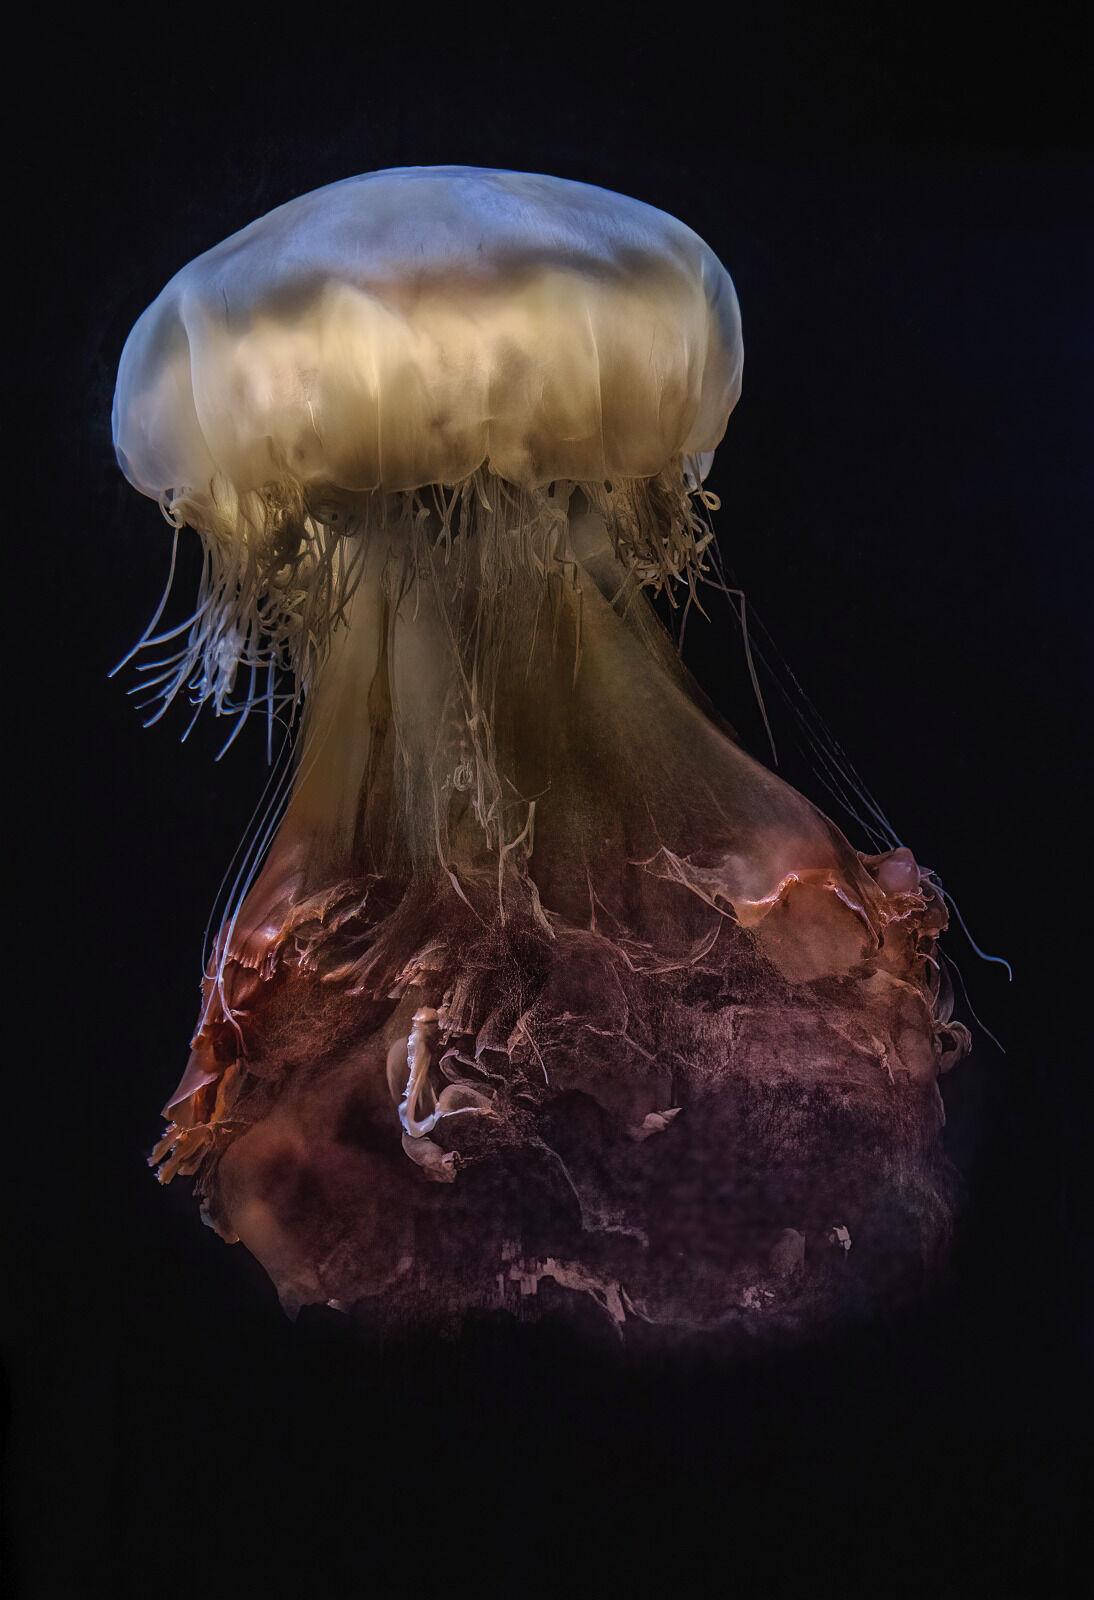 Second - Jellyfish - Martin Janes